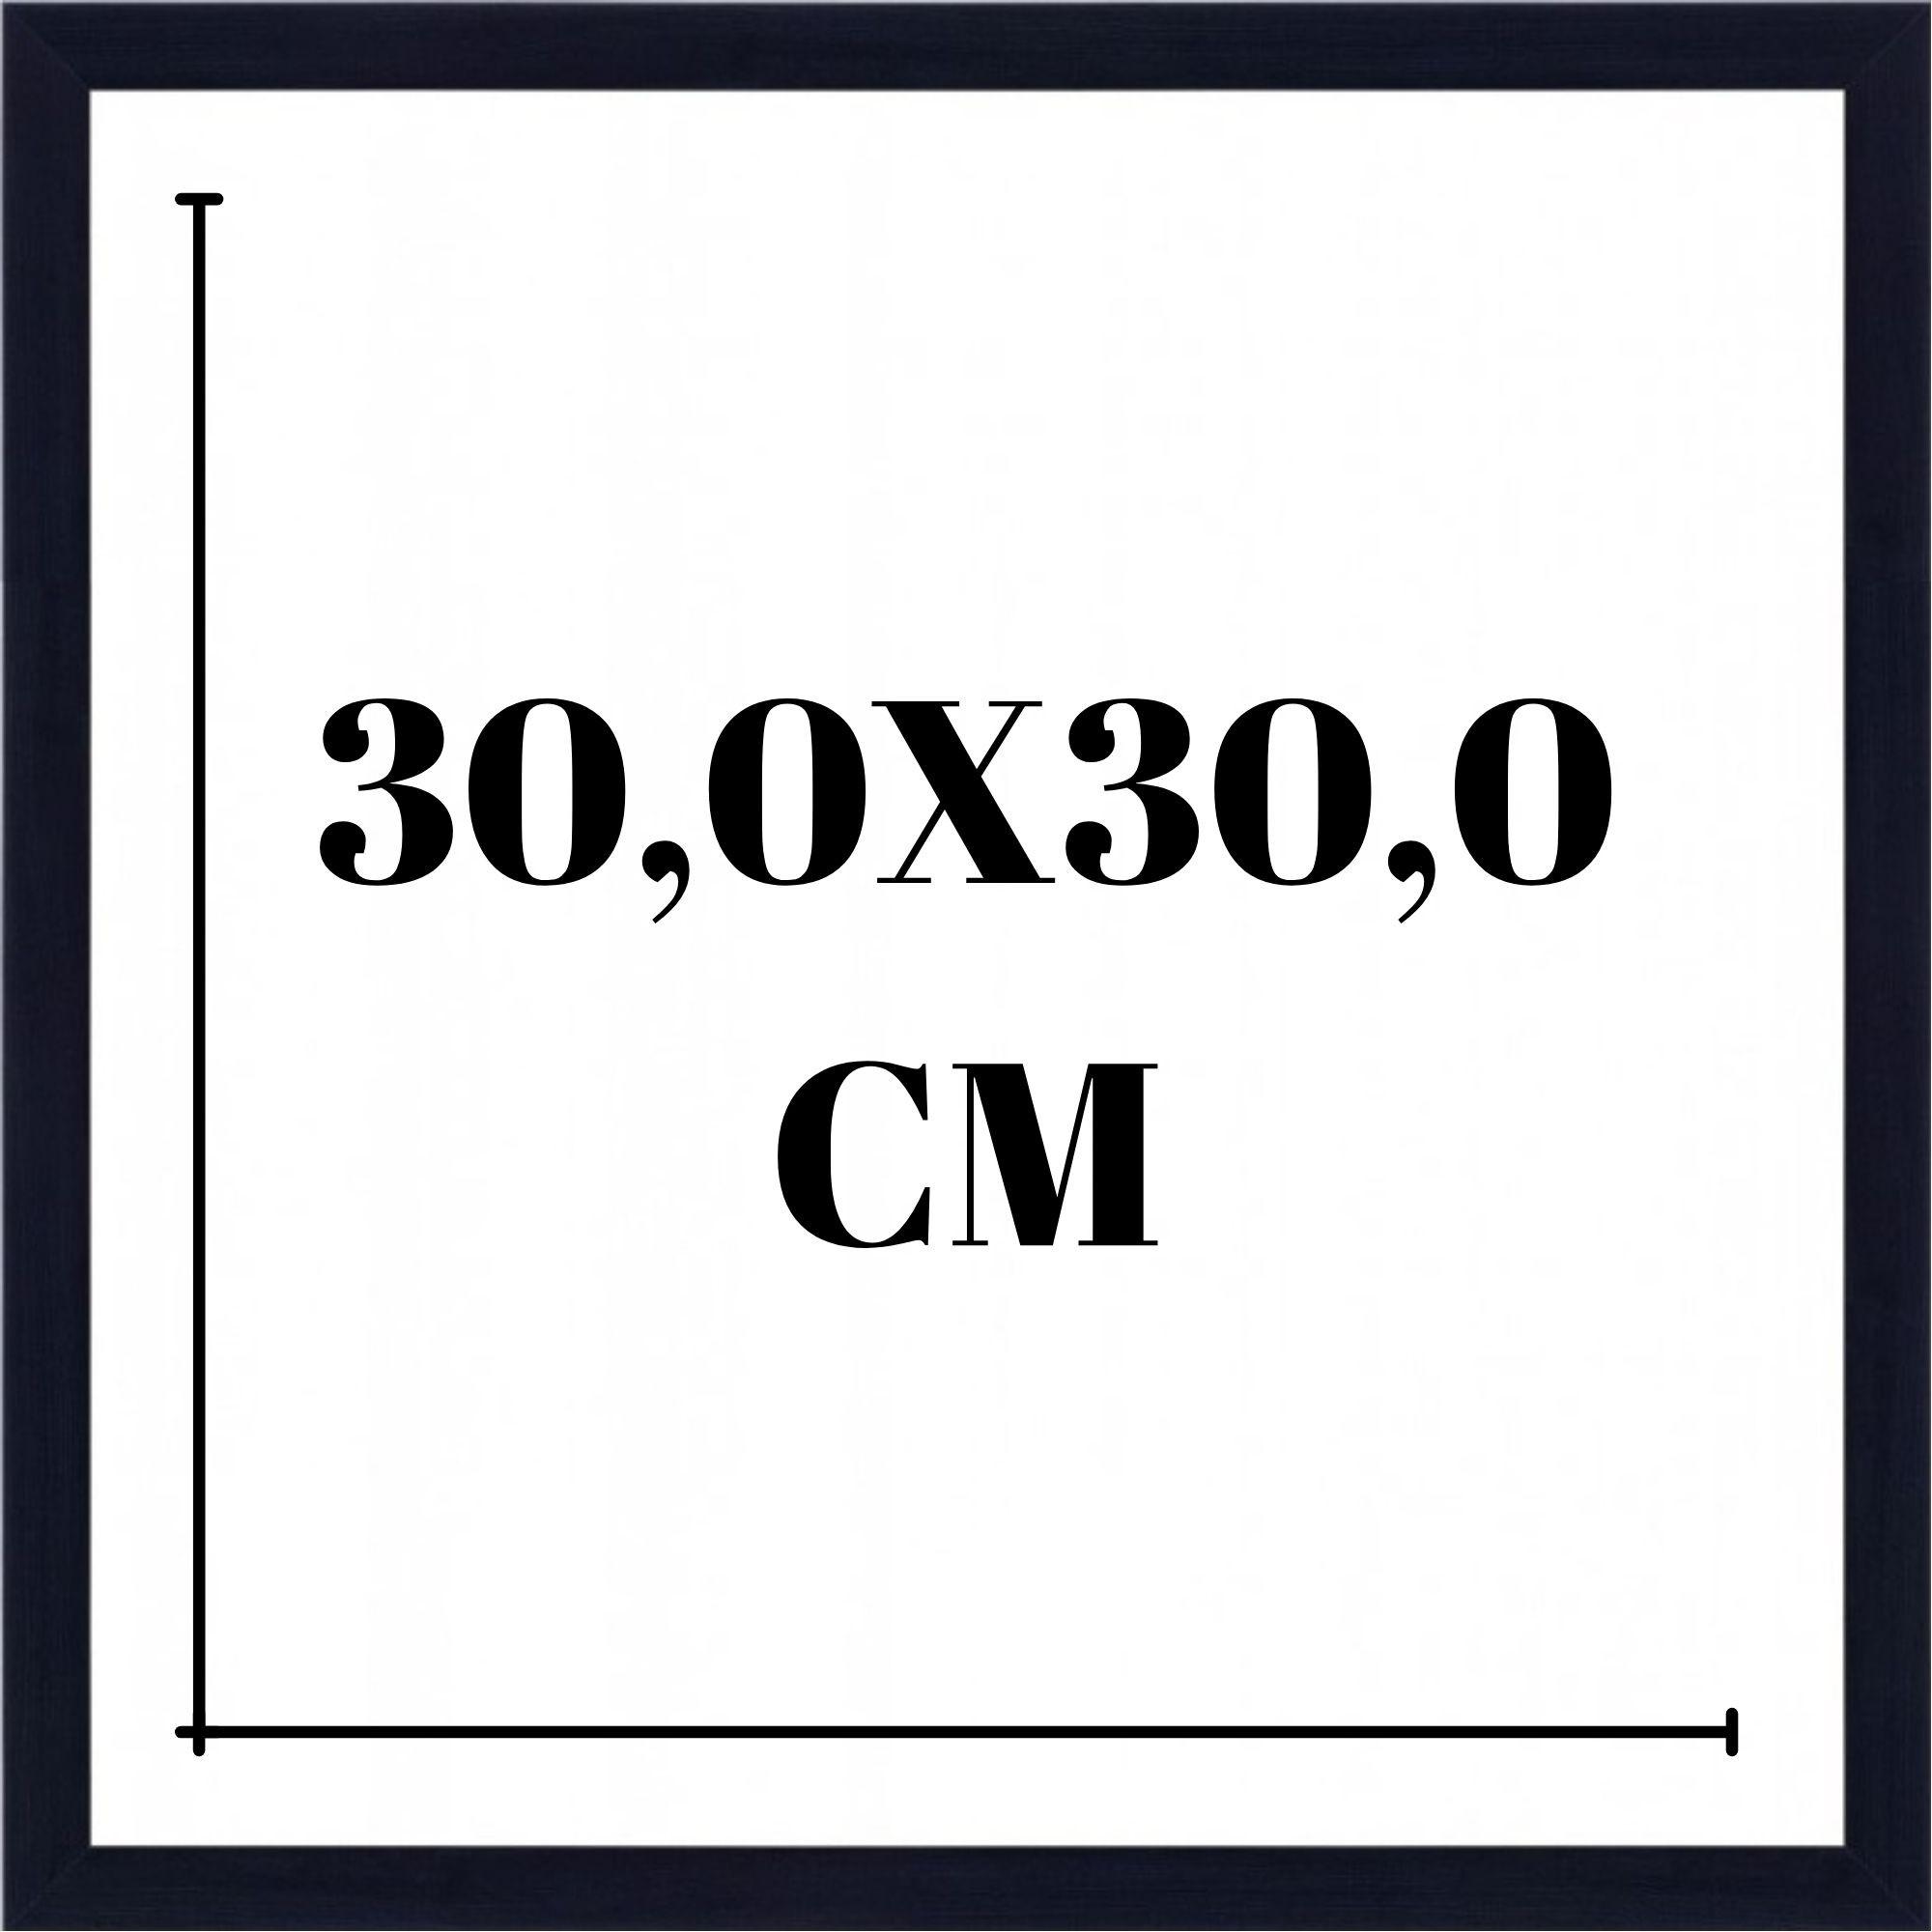 Moldura 30x30 cm